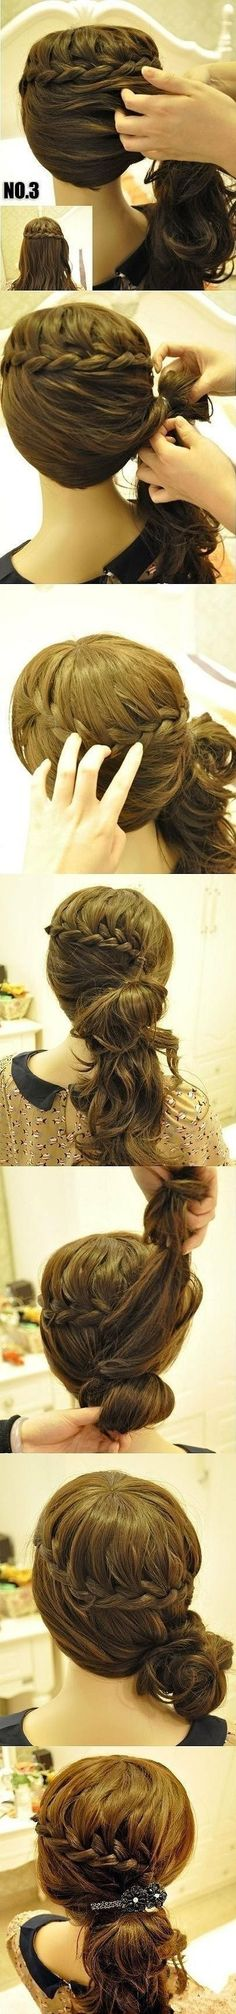 waterfall braid and low bun